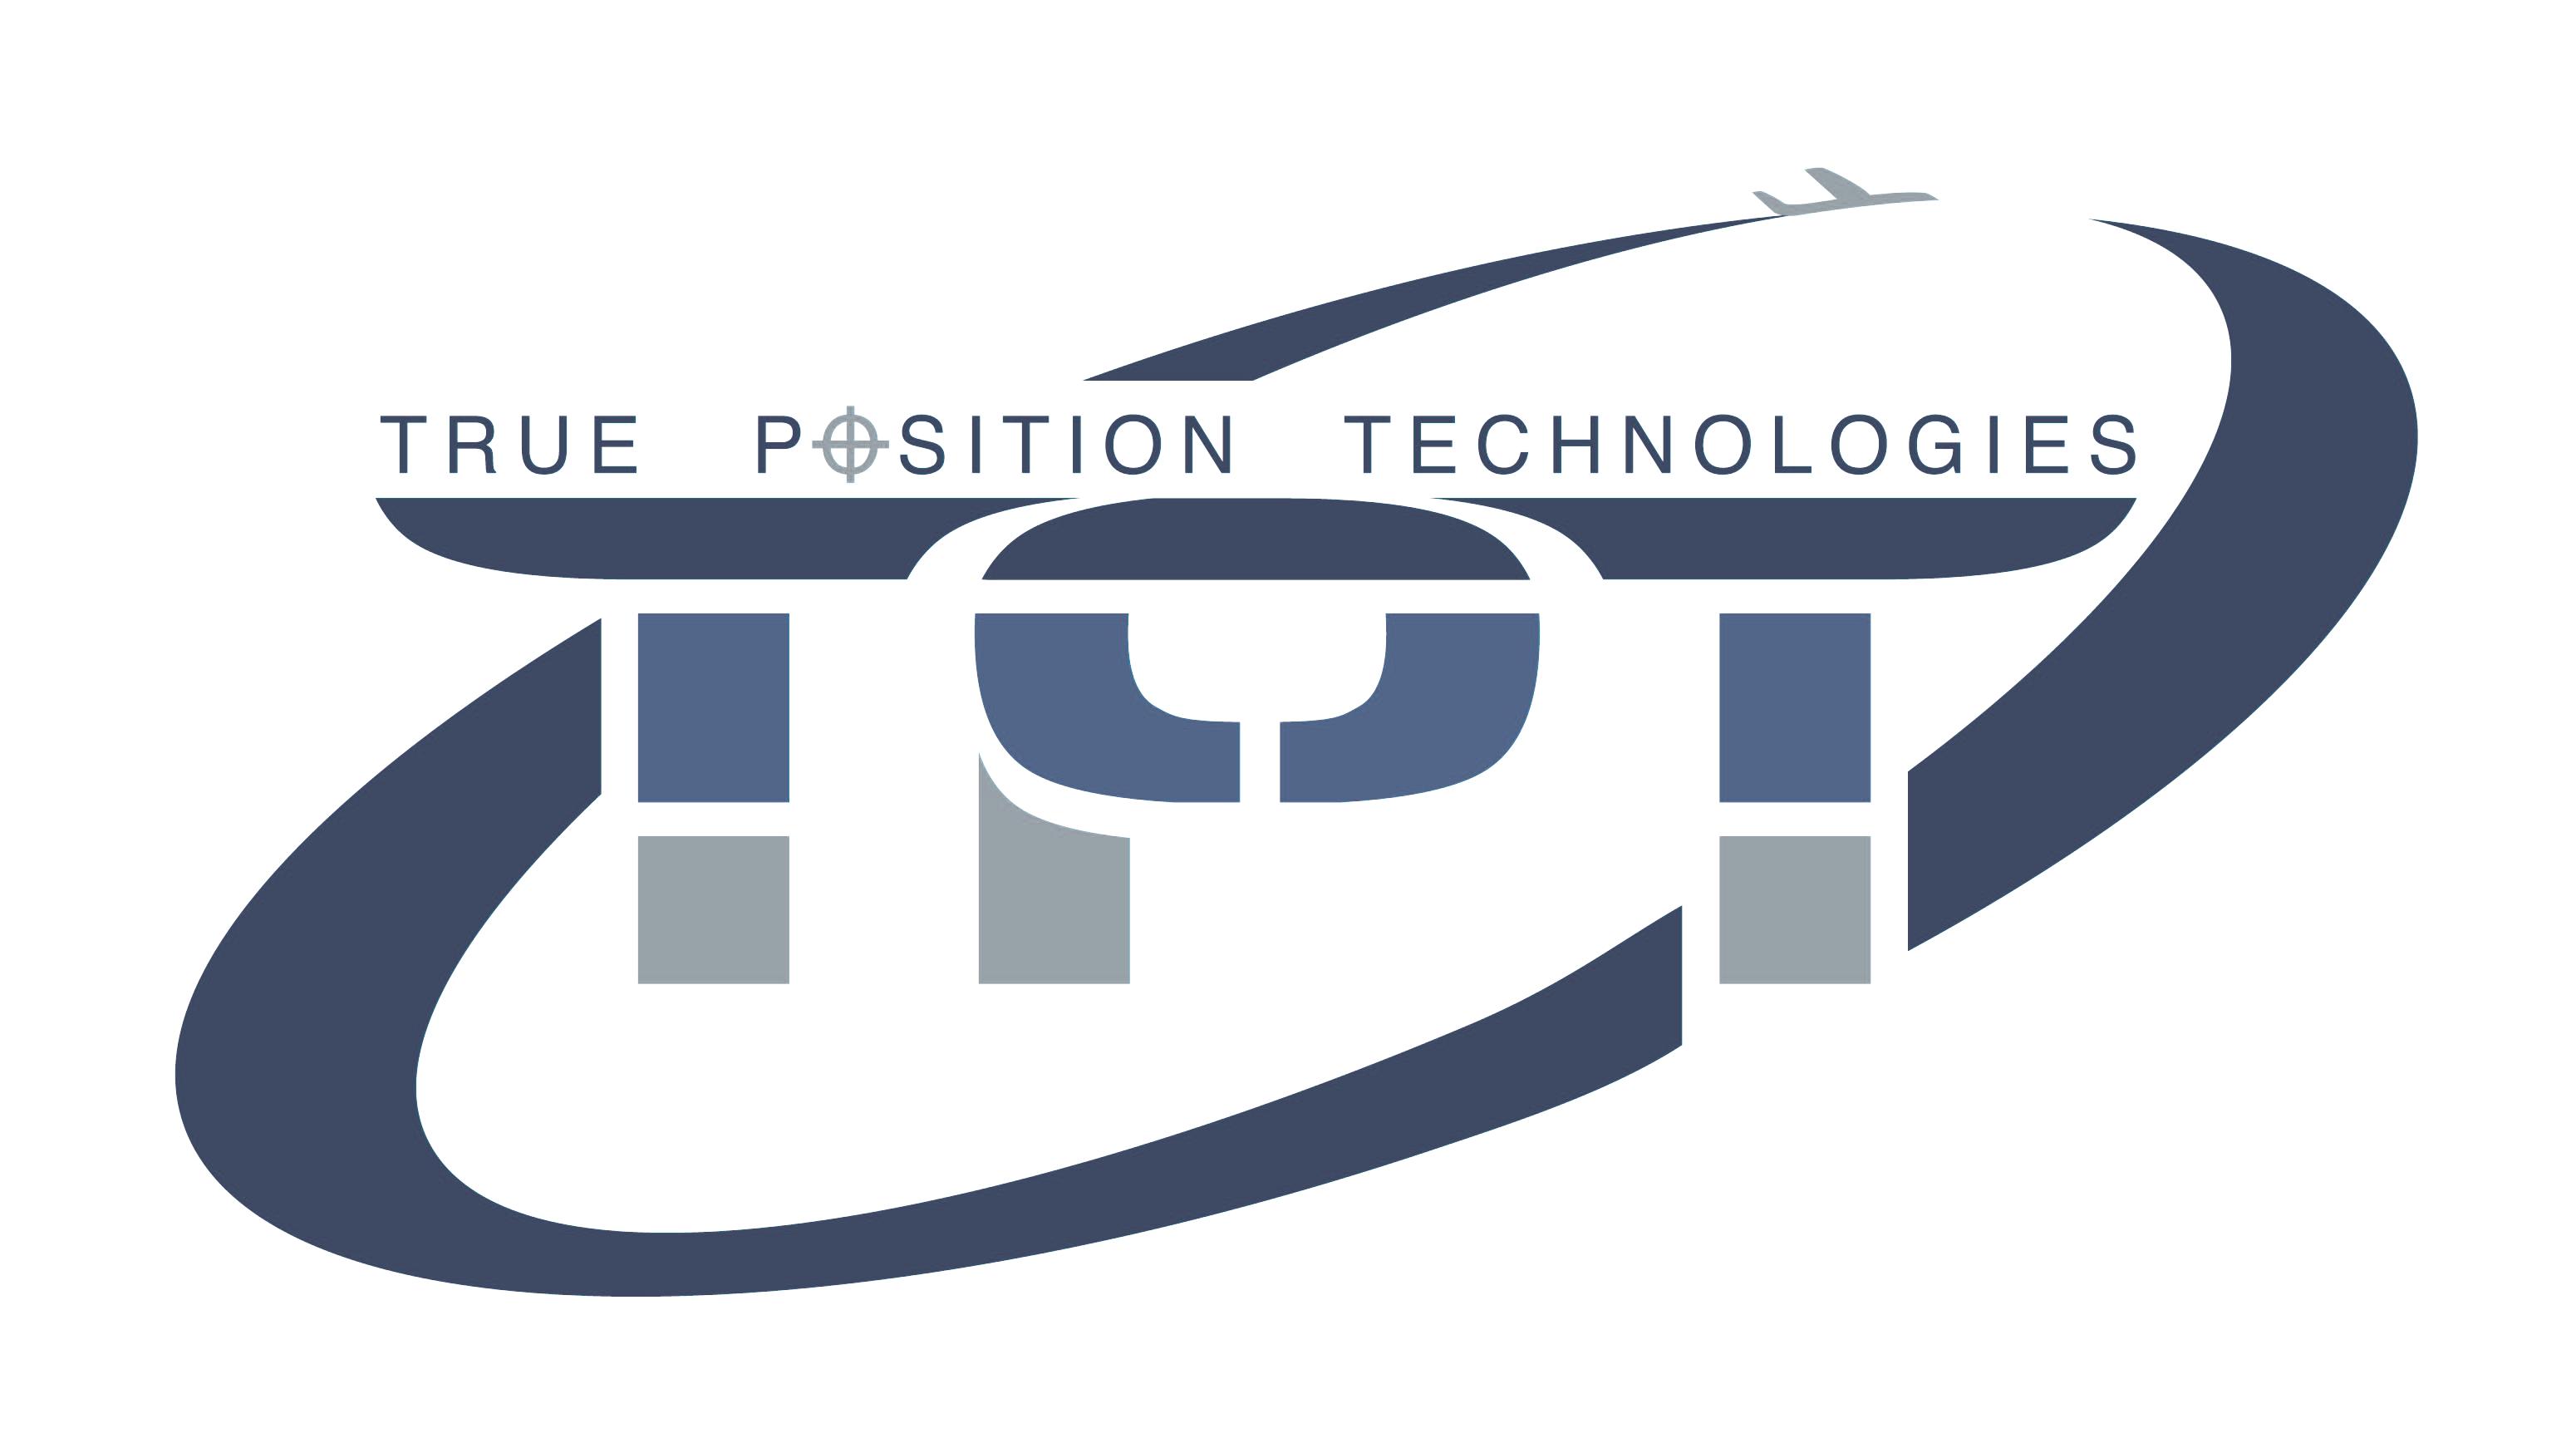 True Position Technologies, Inc.